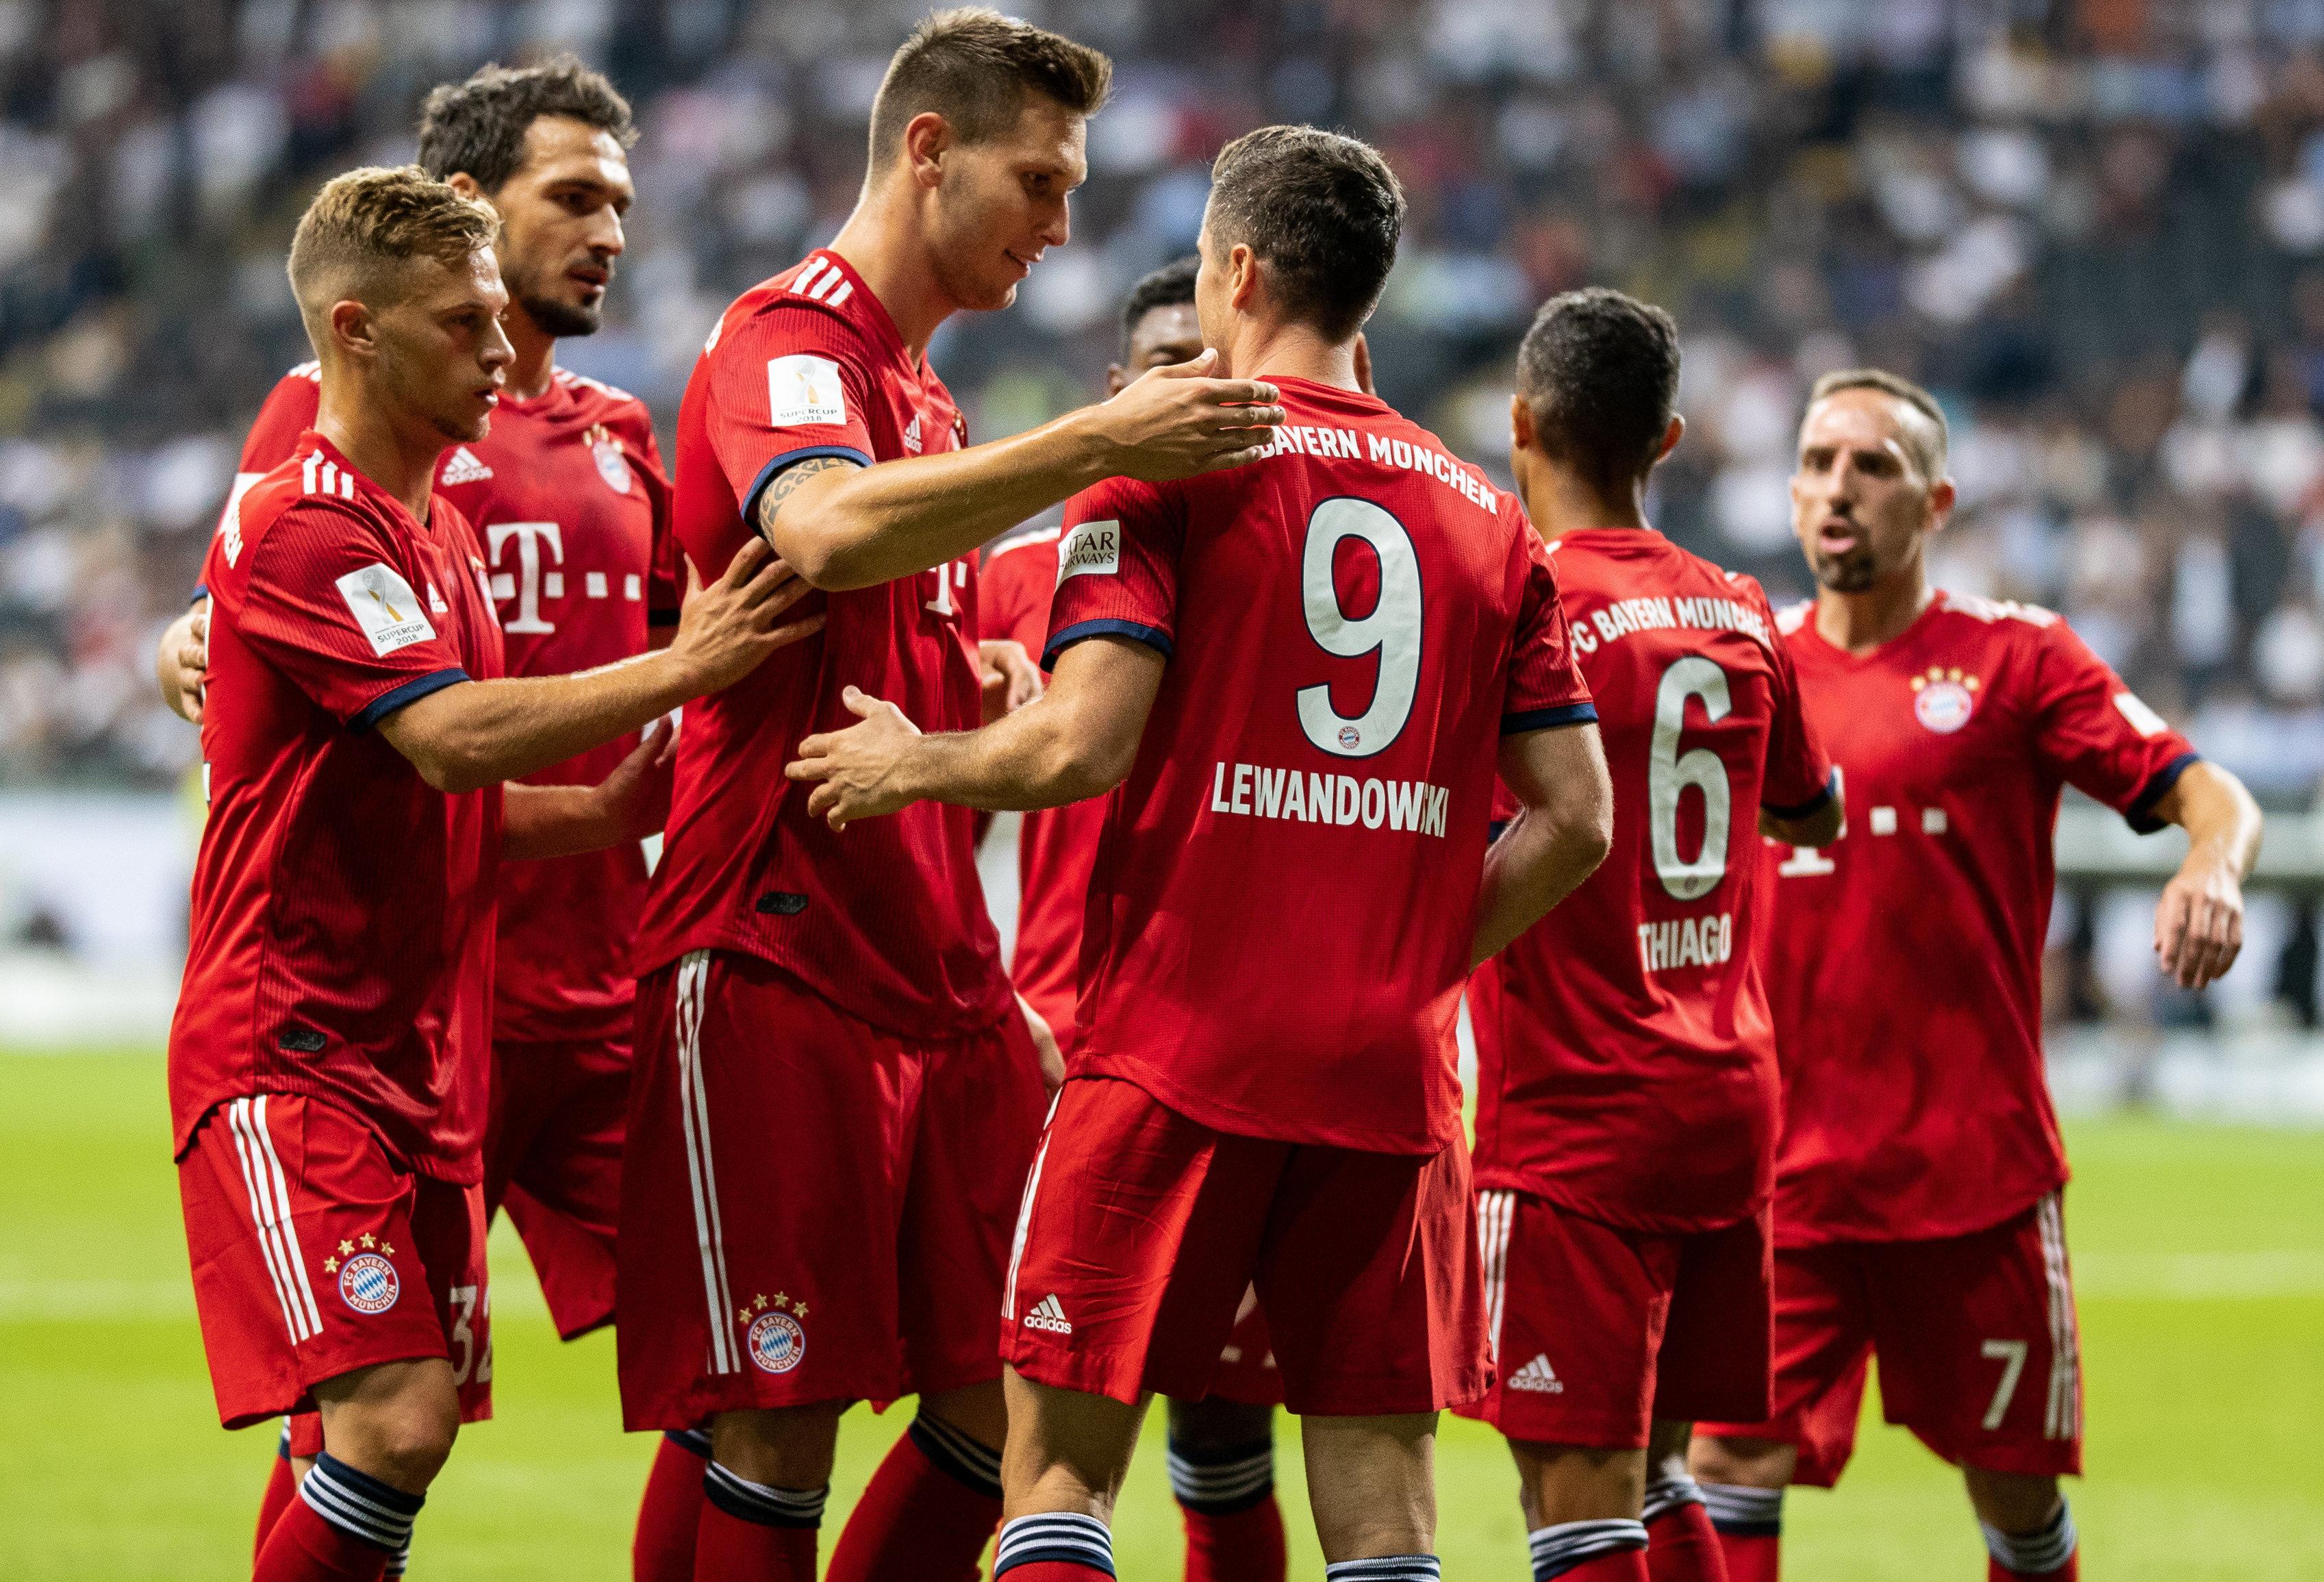 DFB-Pokal im Live-Stream: Drochtersen/Assel – FC Bayern München online